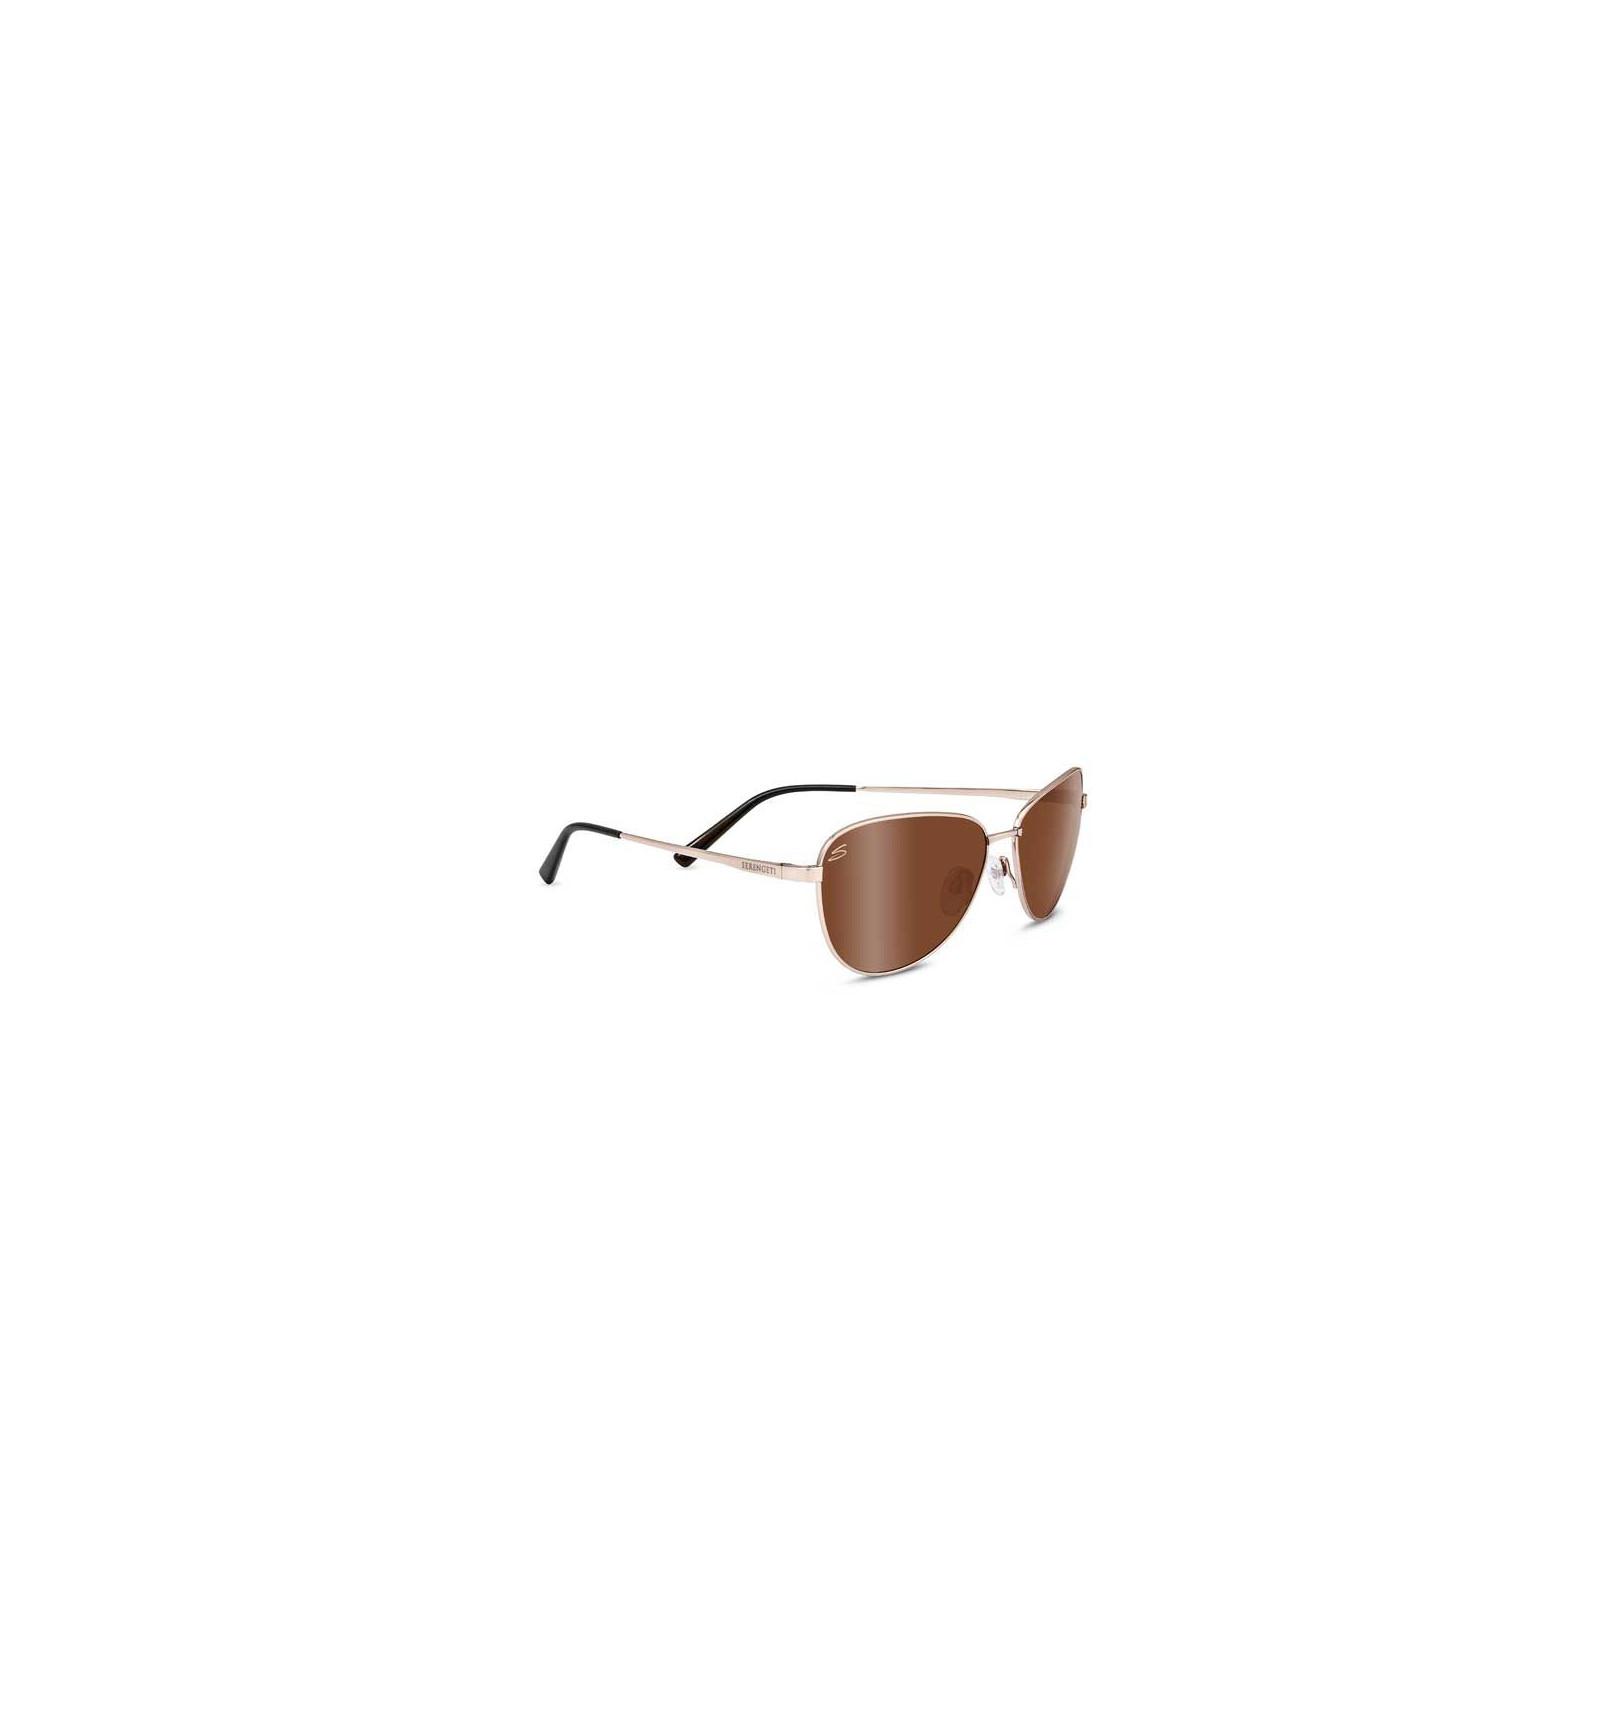 21ad721c44 Gafas de sol Serengeti Gloria - AlpinStore